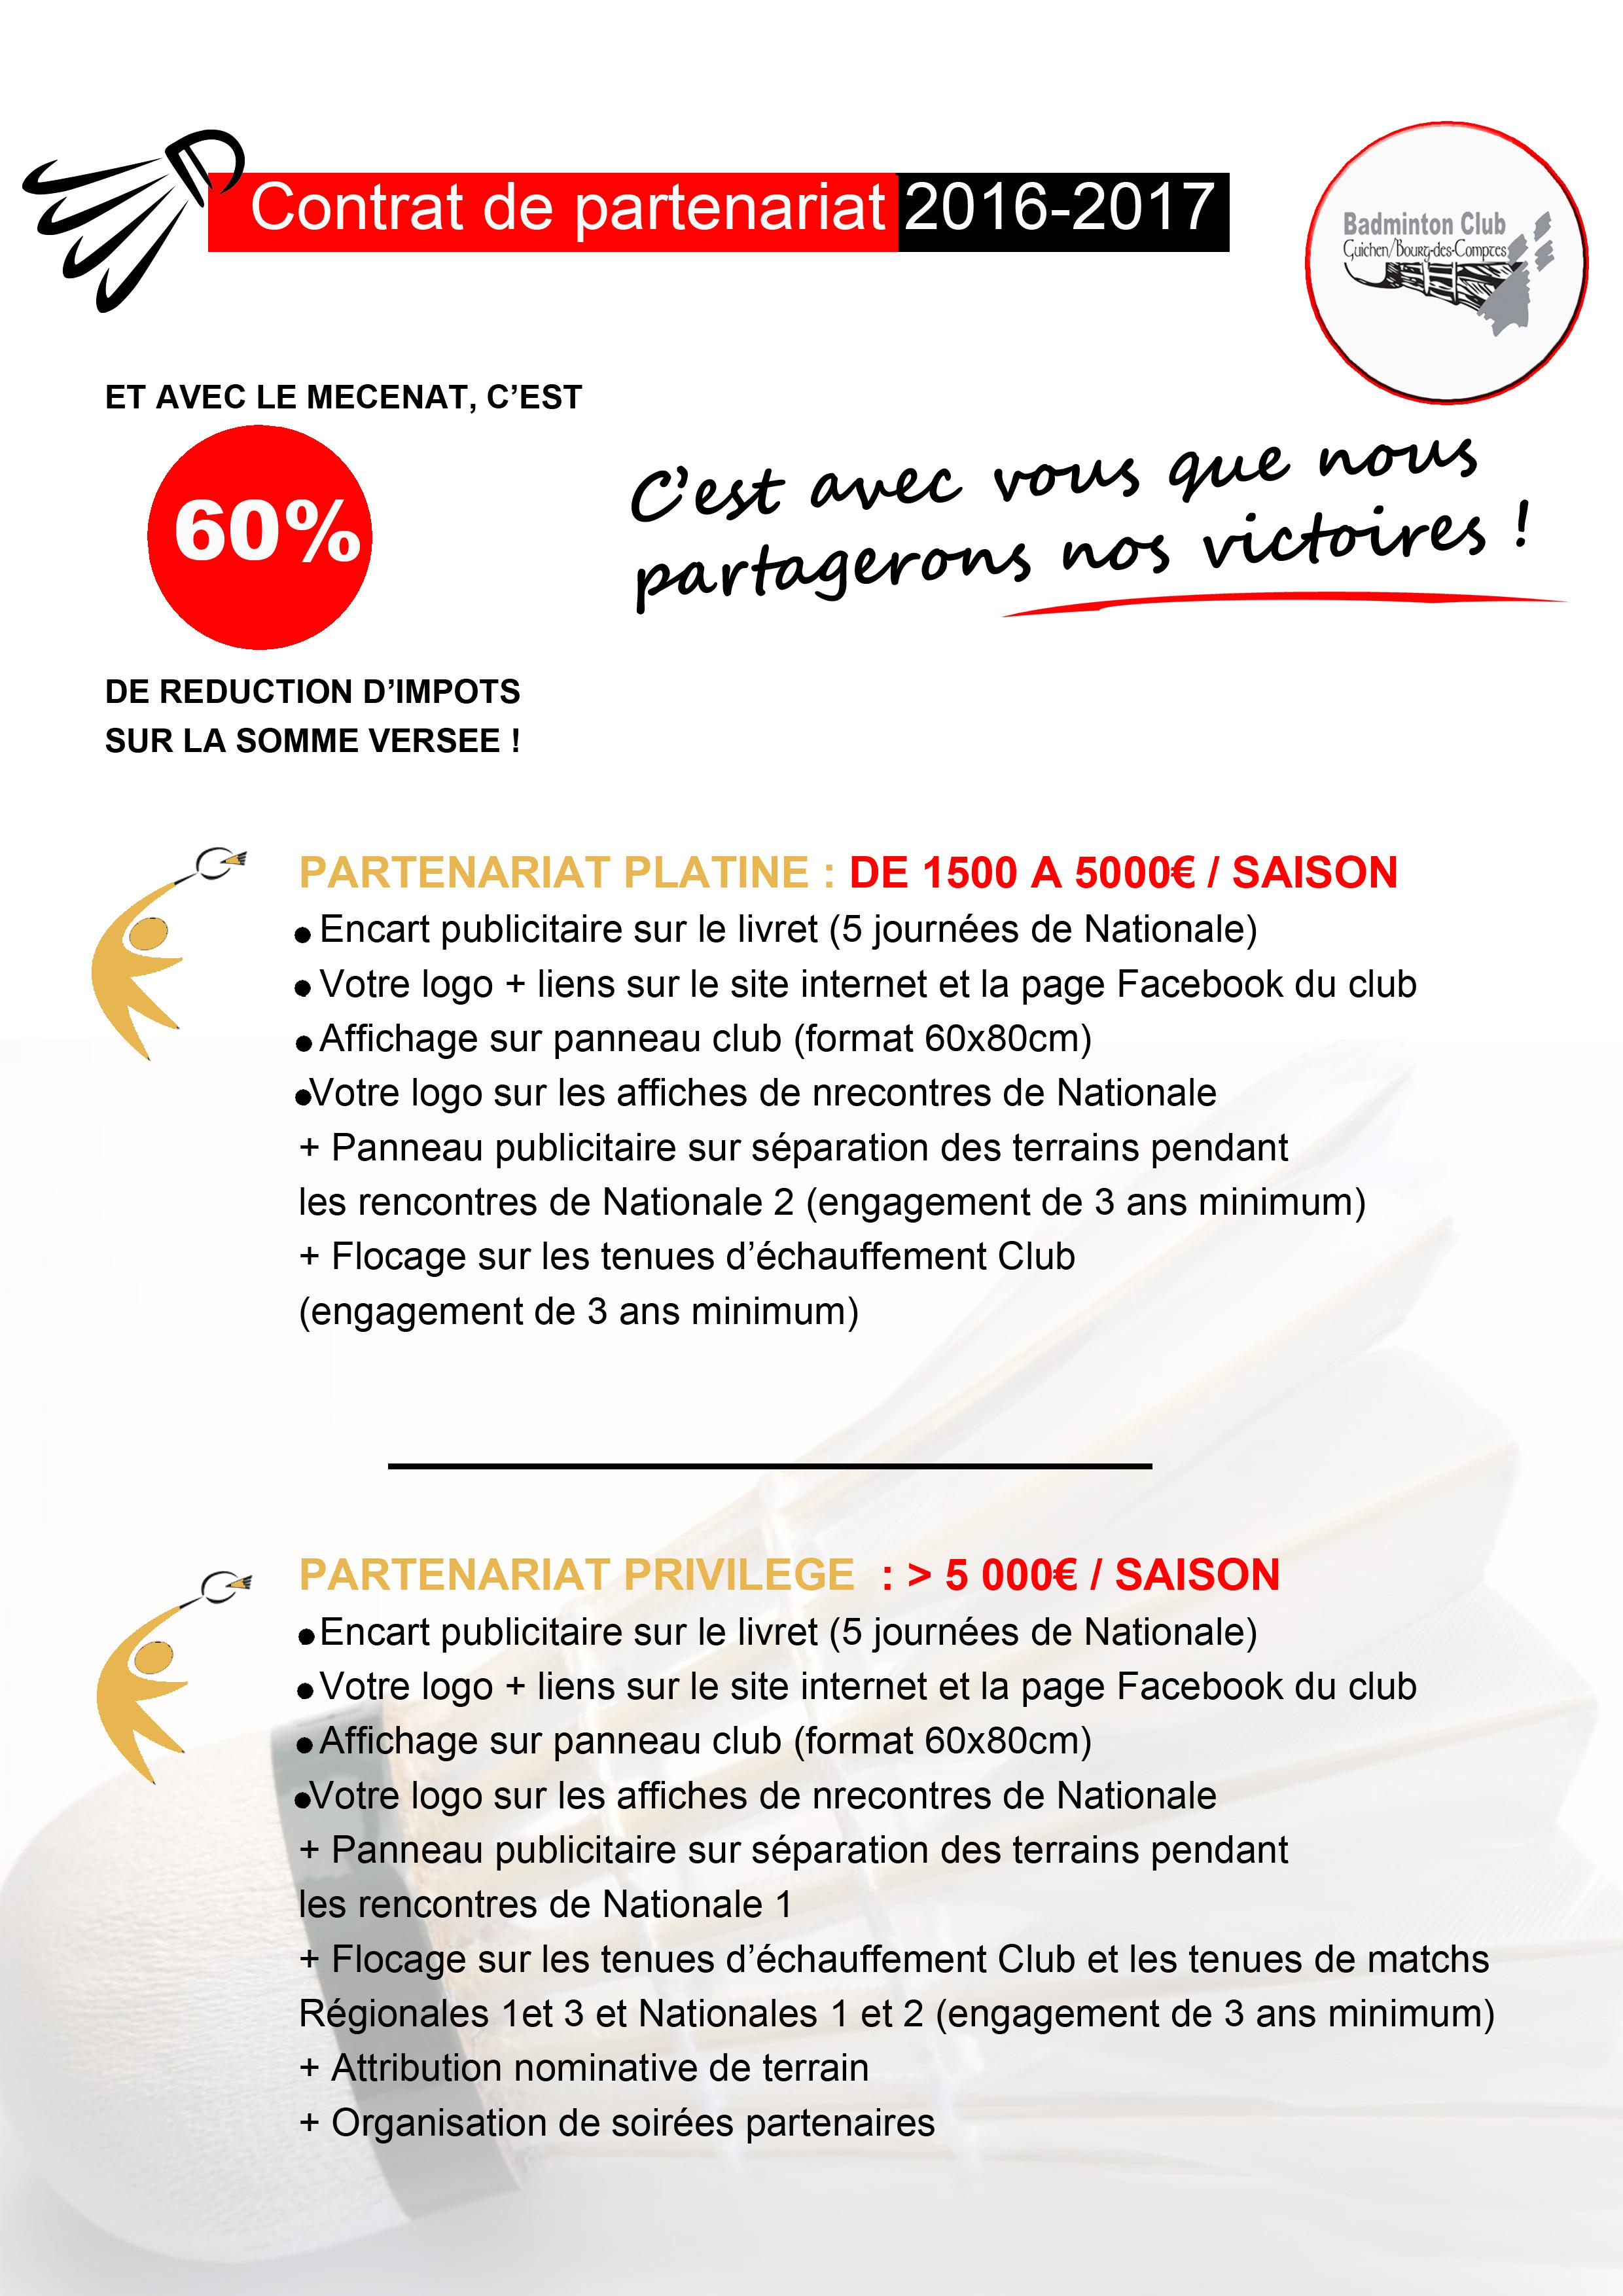 fiche-tarifaire-2-2016-2017